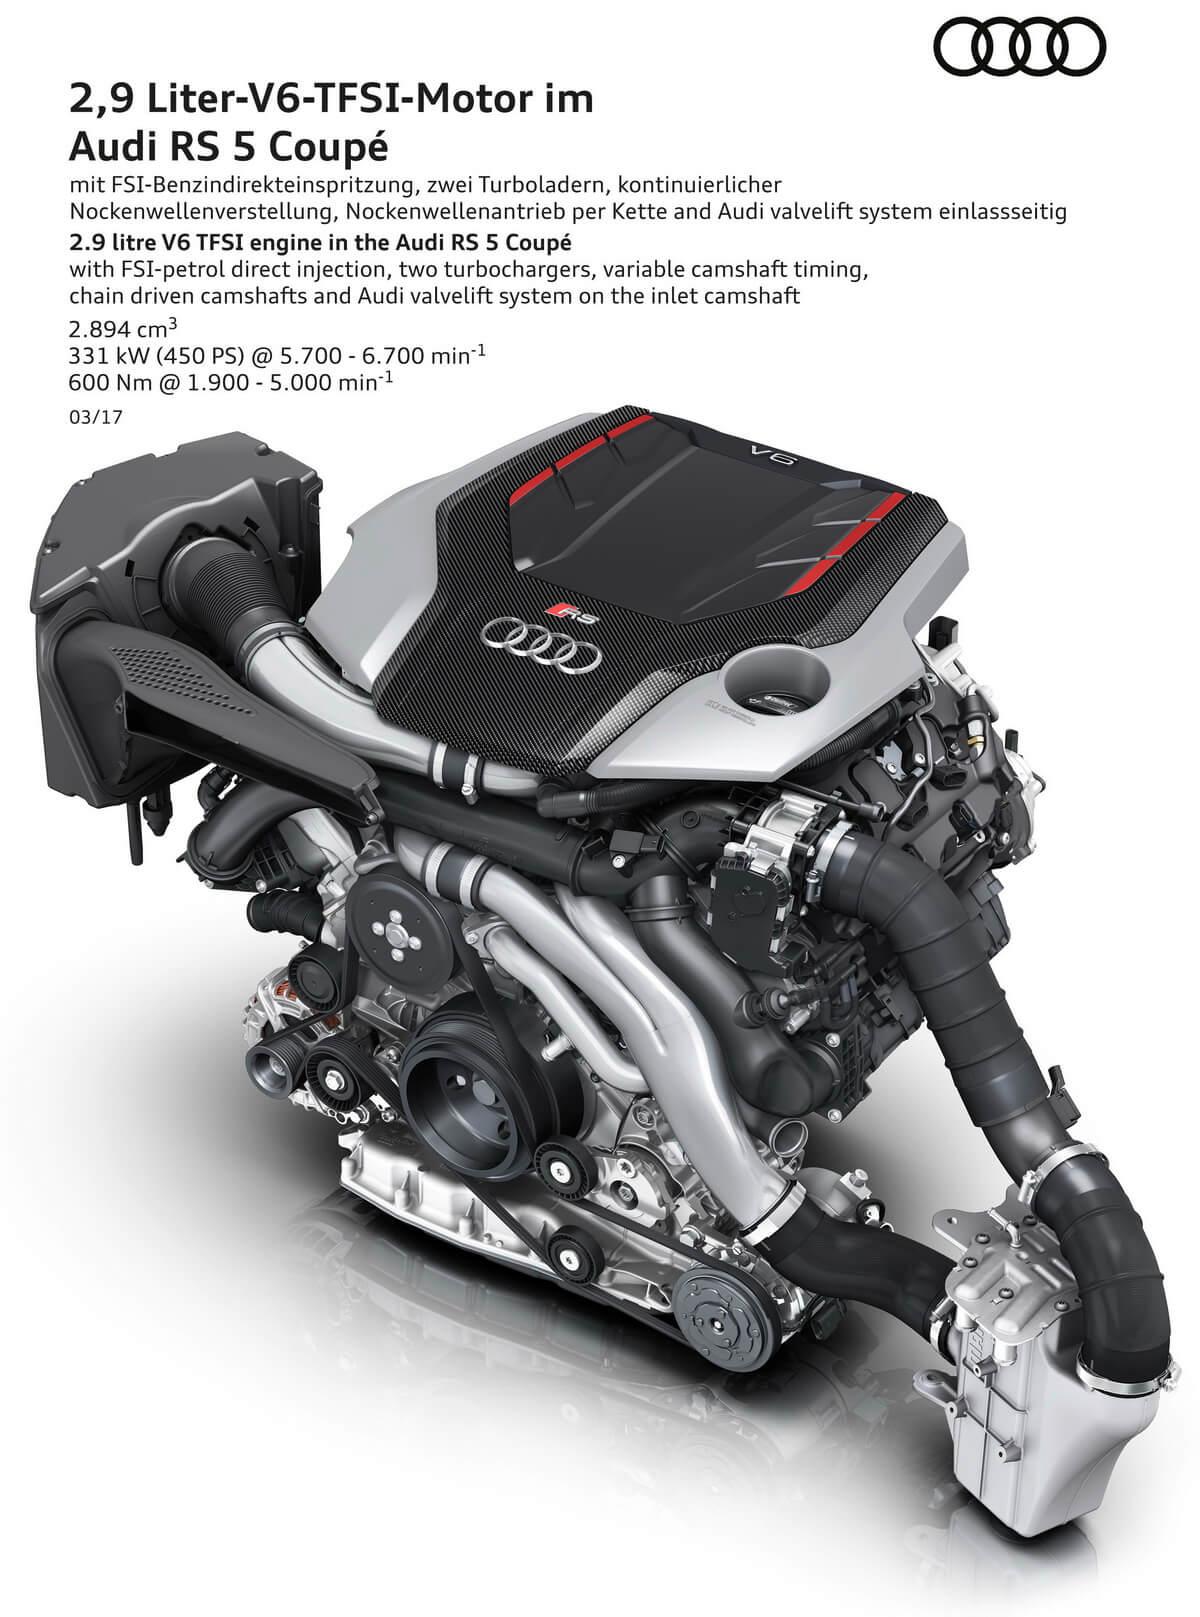 Audi RS 5 Coupé moteur V6 2.9L biturbo